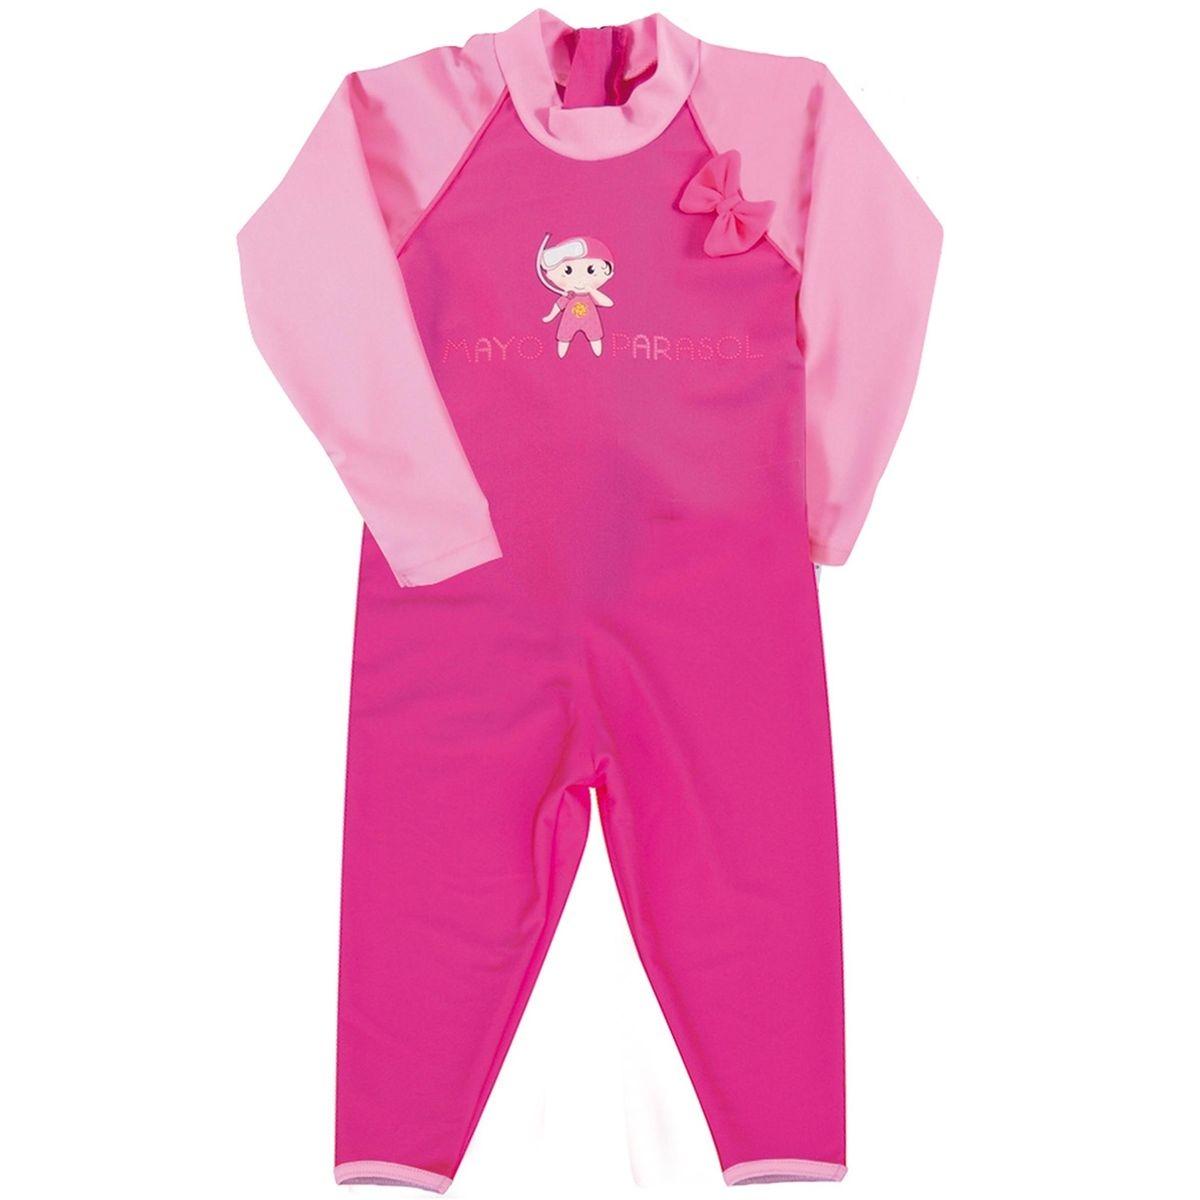 Rosie Mangue   combinaison maillot anti UV Manches et jambes longues